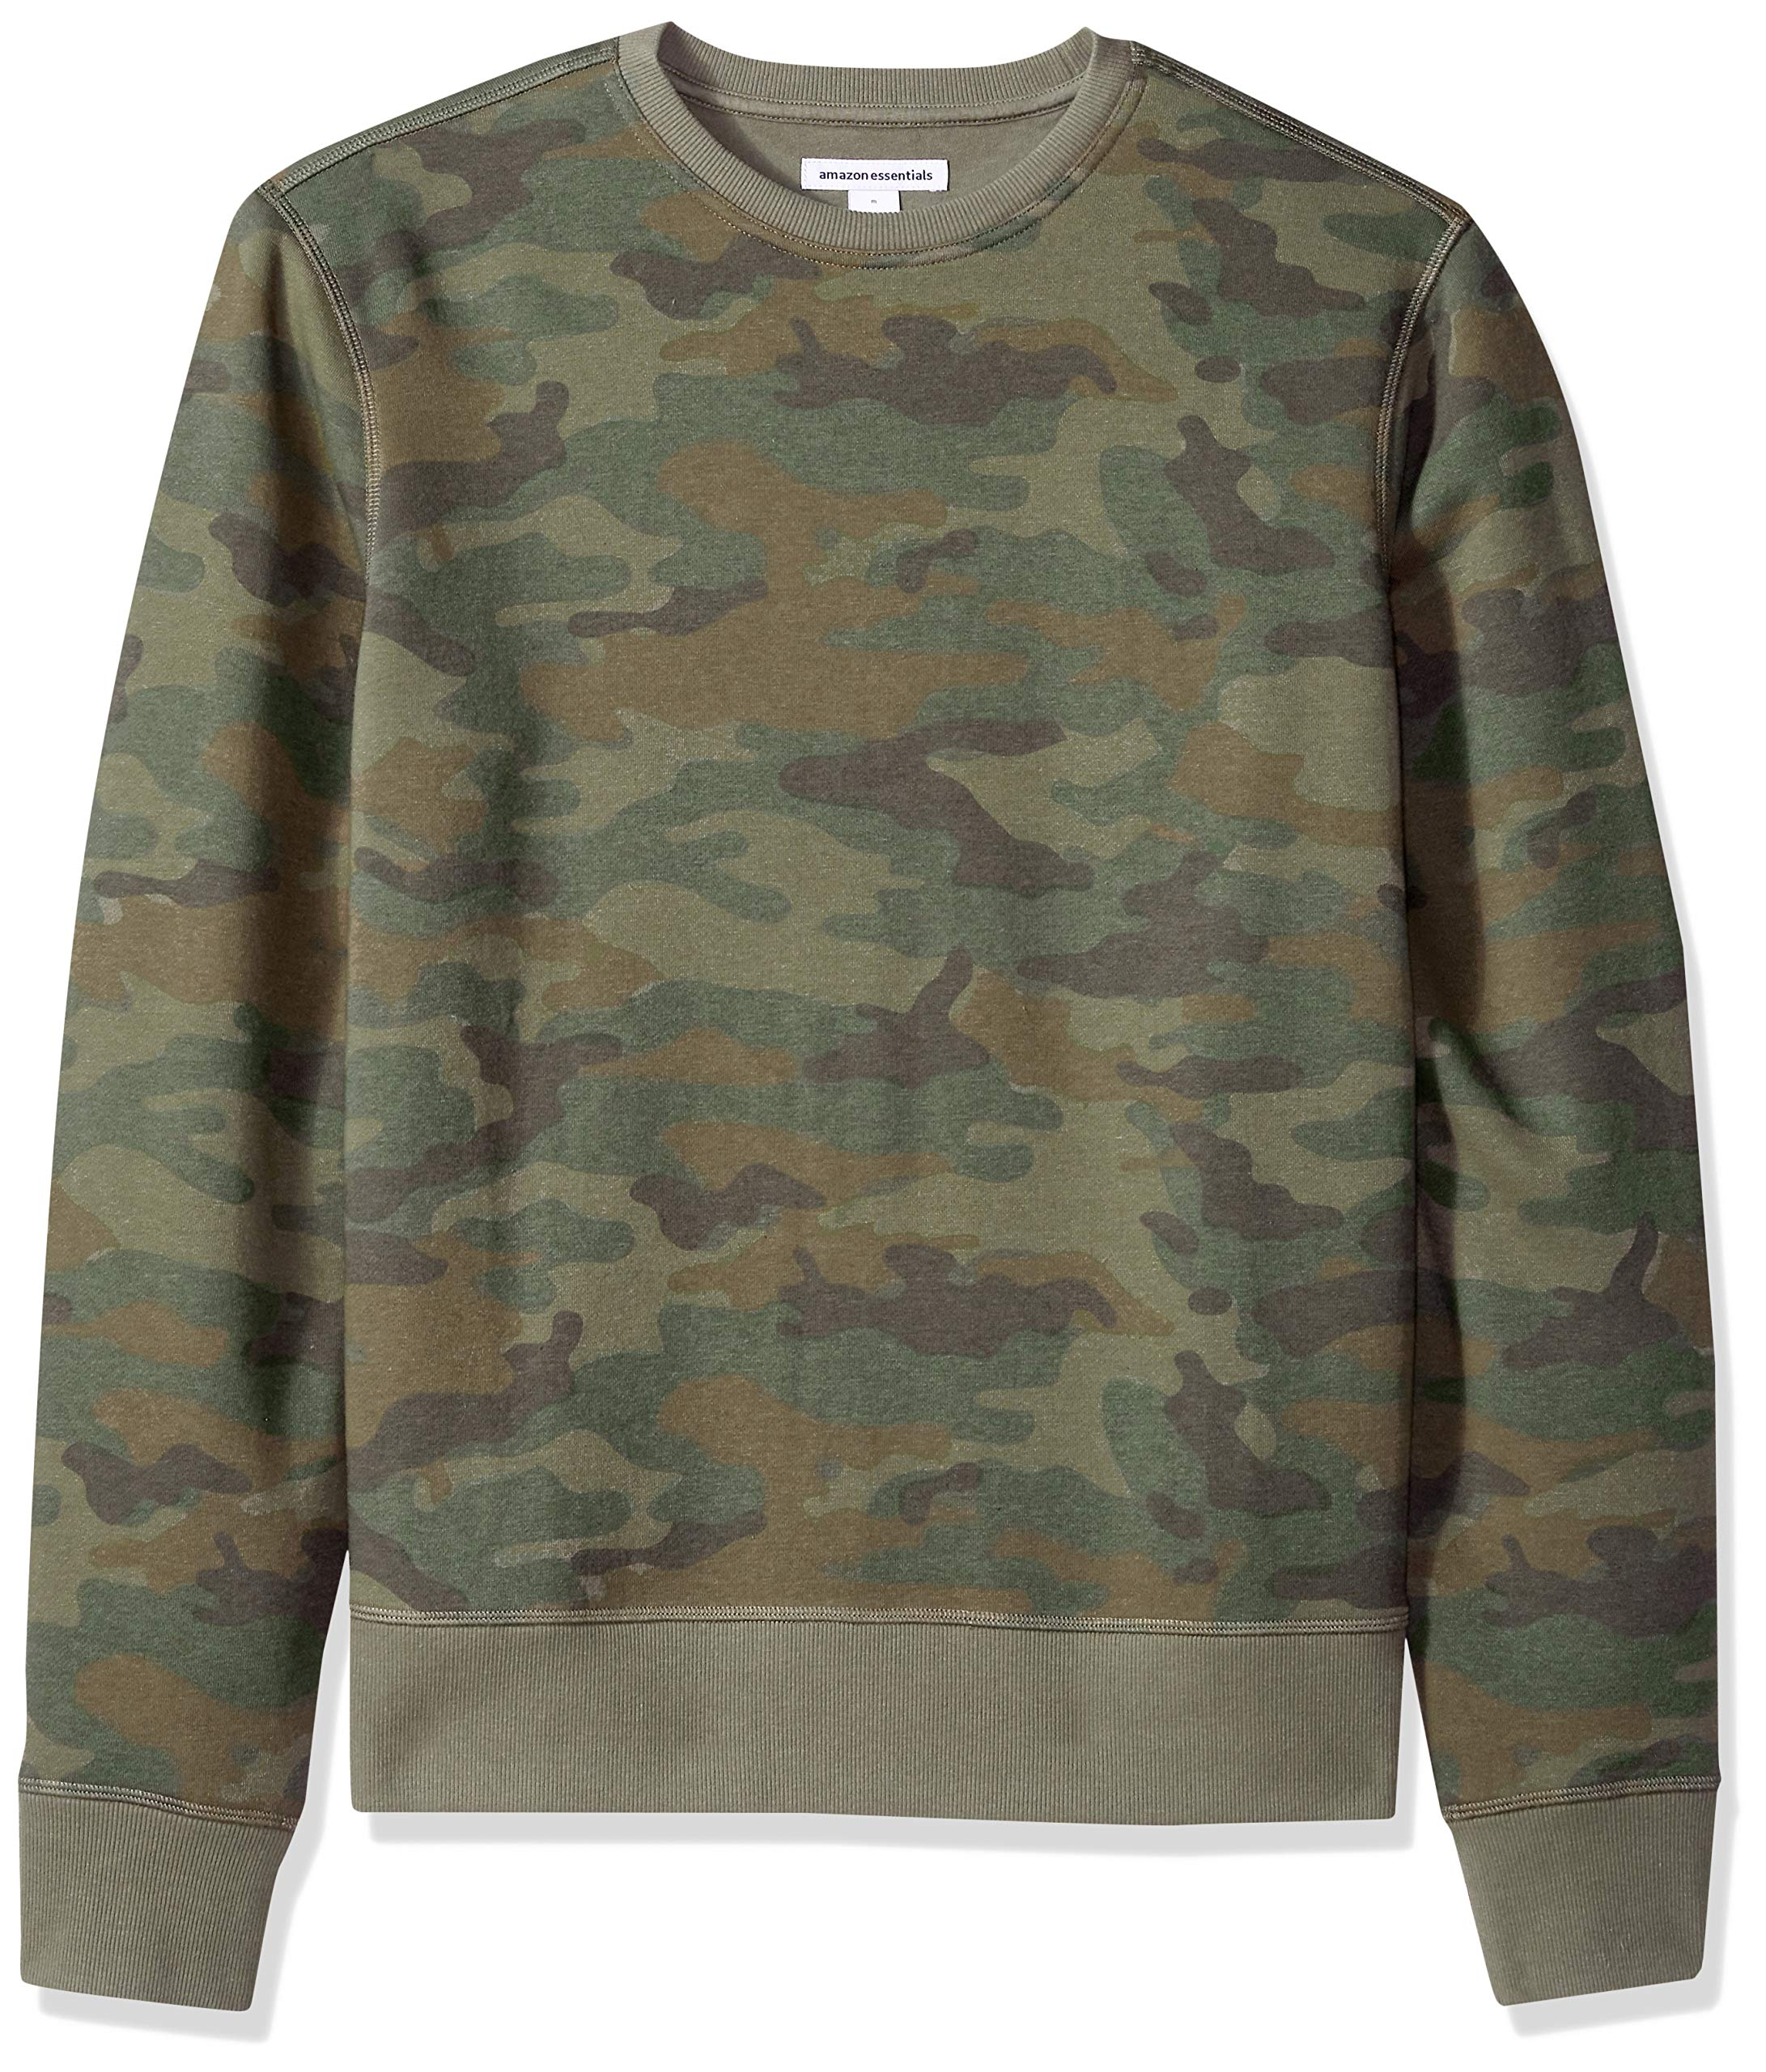 Amazon Essentials Men's Crewneck Fleece Sweatshirt, Camo, X-Large by Amazon Essentials